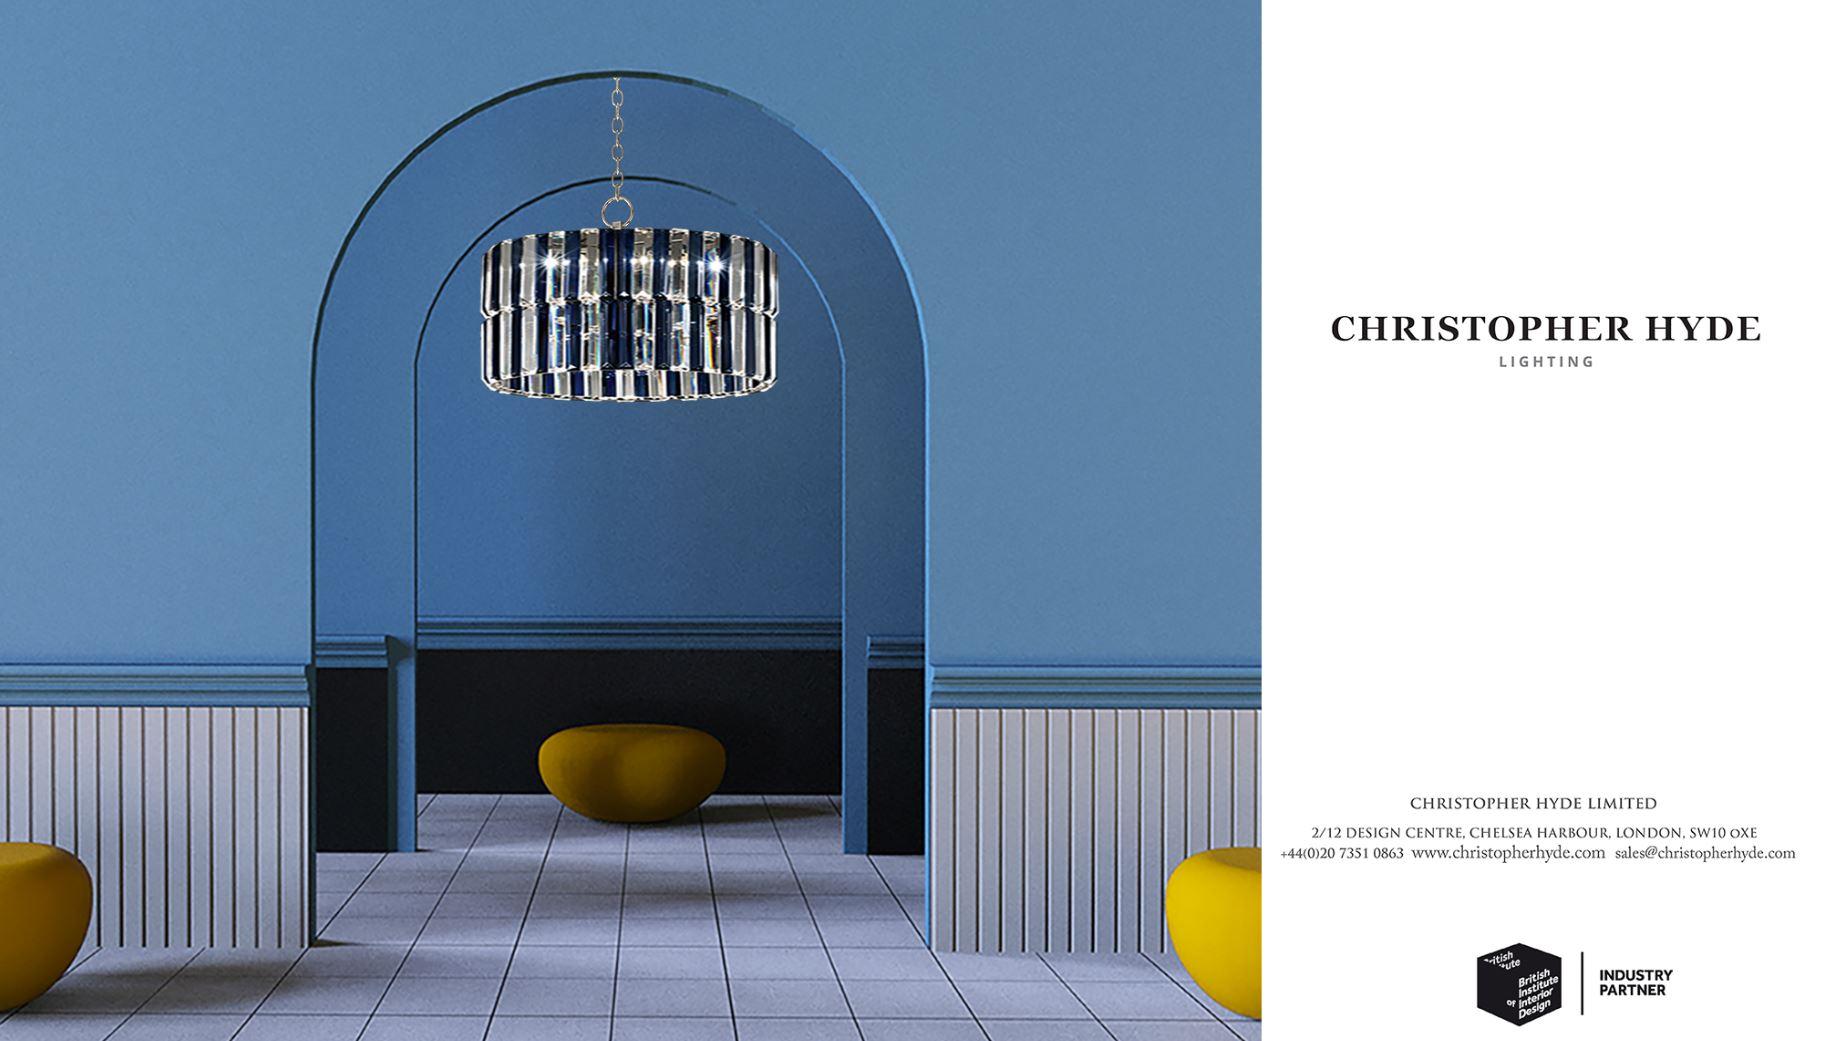 Press | Life Style | Christopher Hyde Lighting - Lighting for